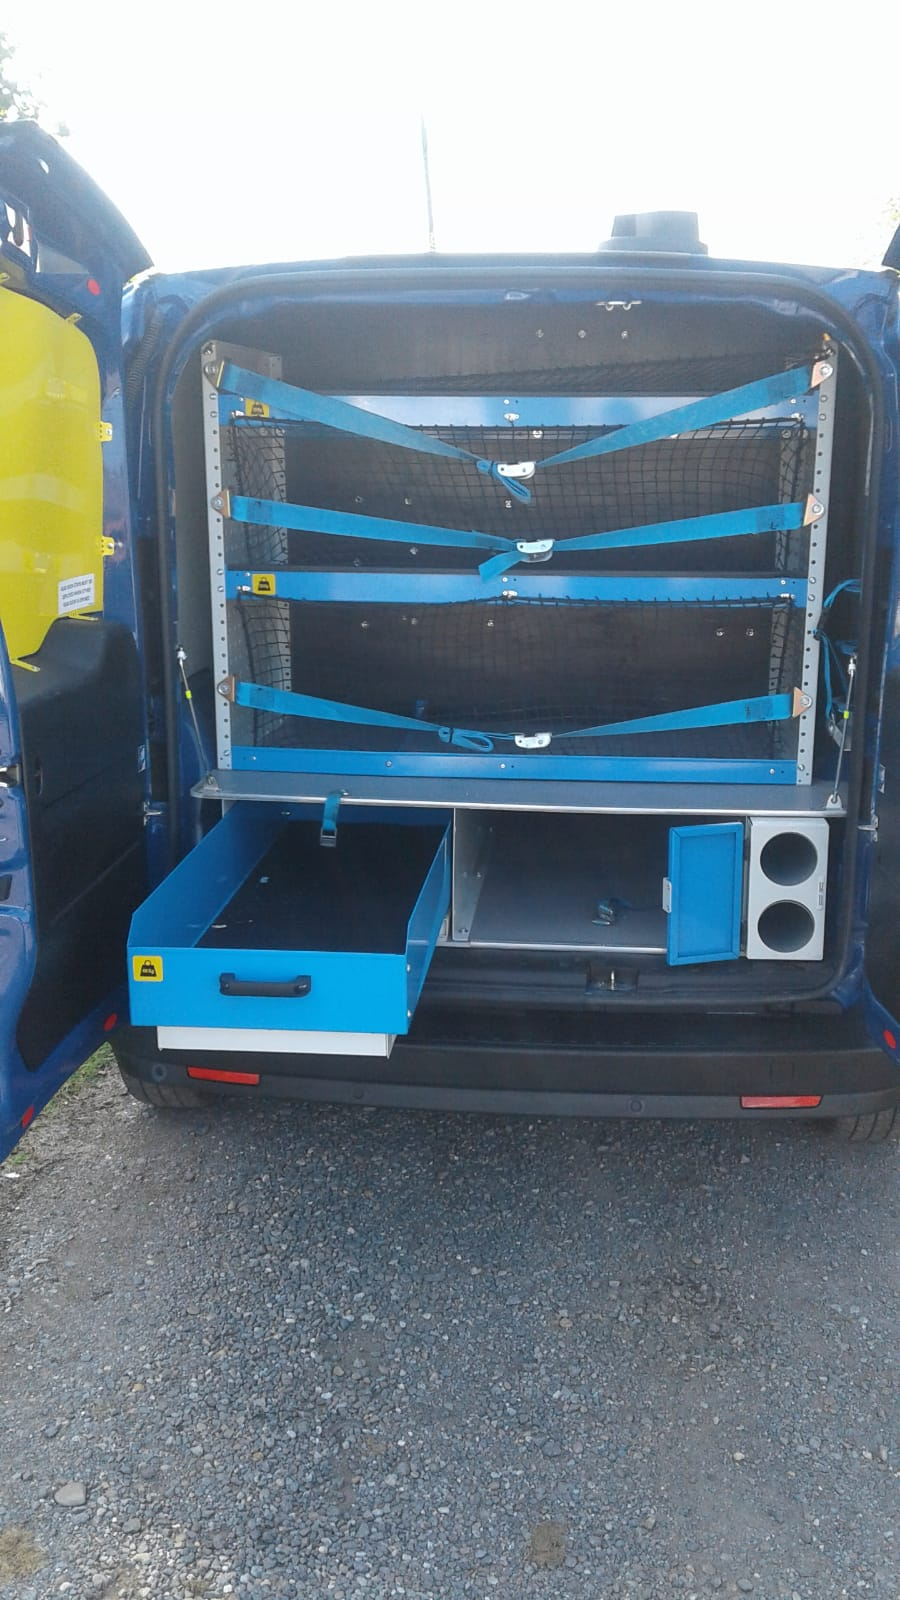 Lot 9 - 2016/16 REG FIAT DOBLO SX MULTI-JET 1.25 DIESEL BLUE PANEL VAN, SHOWING 0 FORMER KEEPERS *NO VAT*